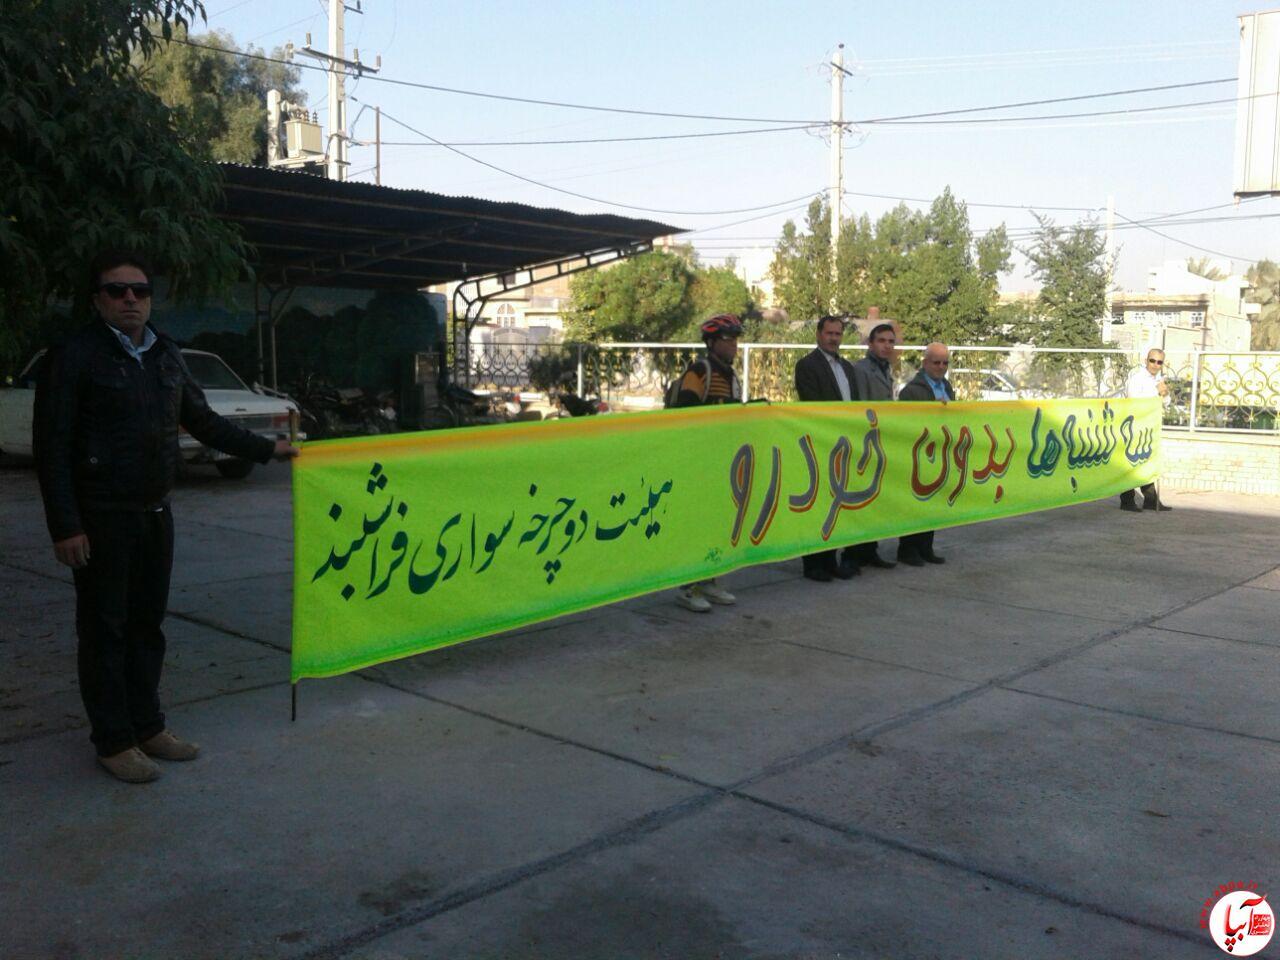 IMG-20170201-WA0001 توسعه فرهنگی با رکاب دوچرخه سواران